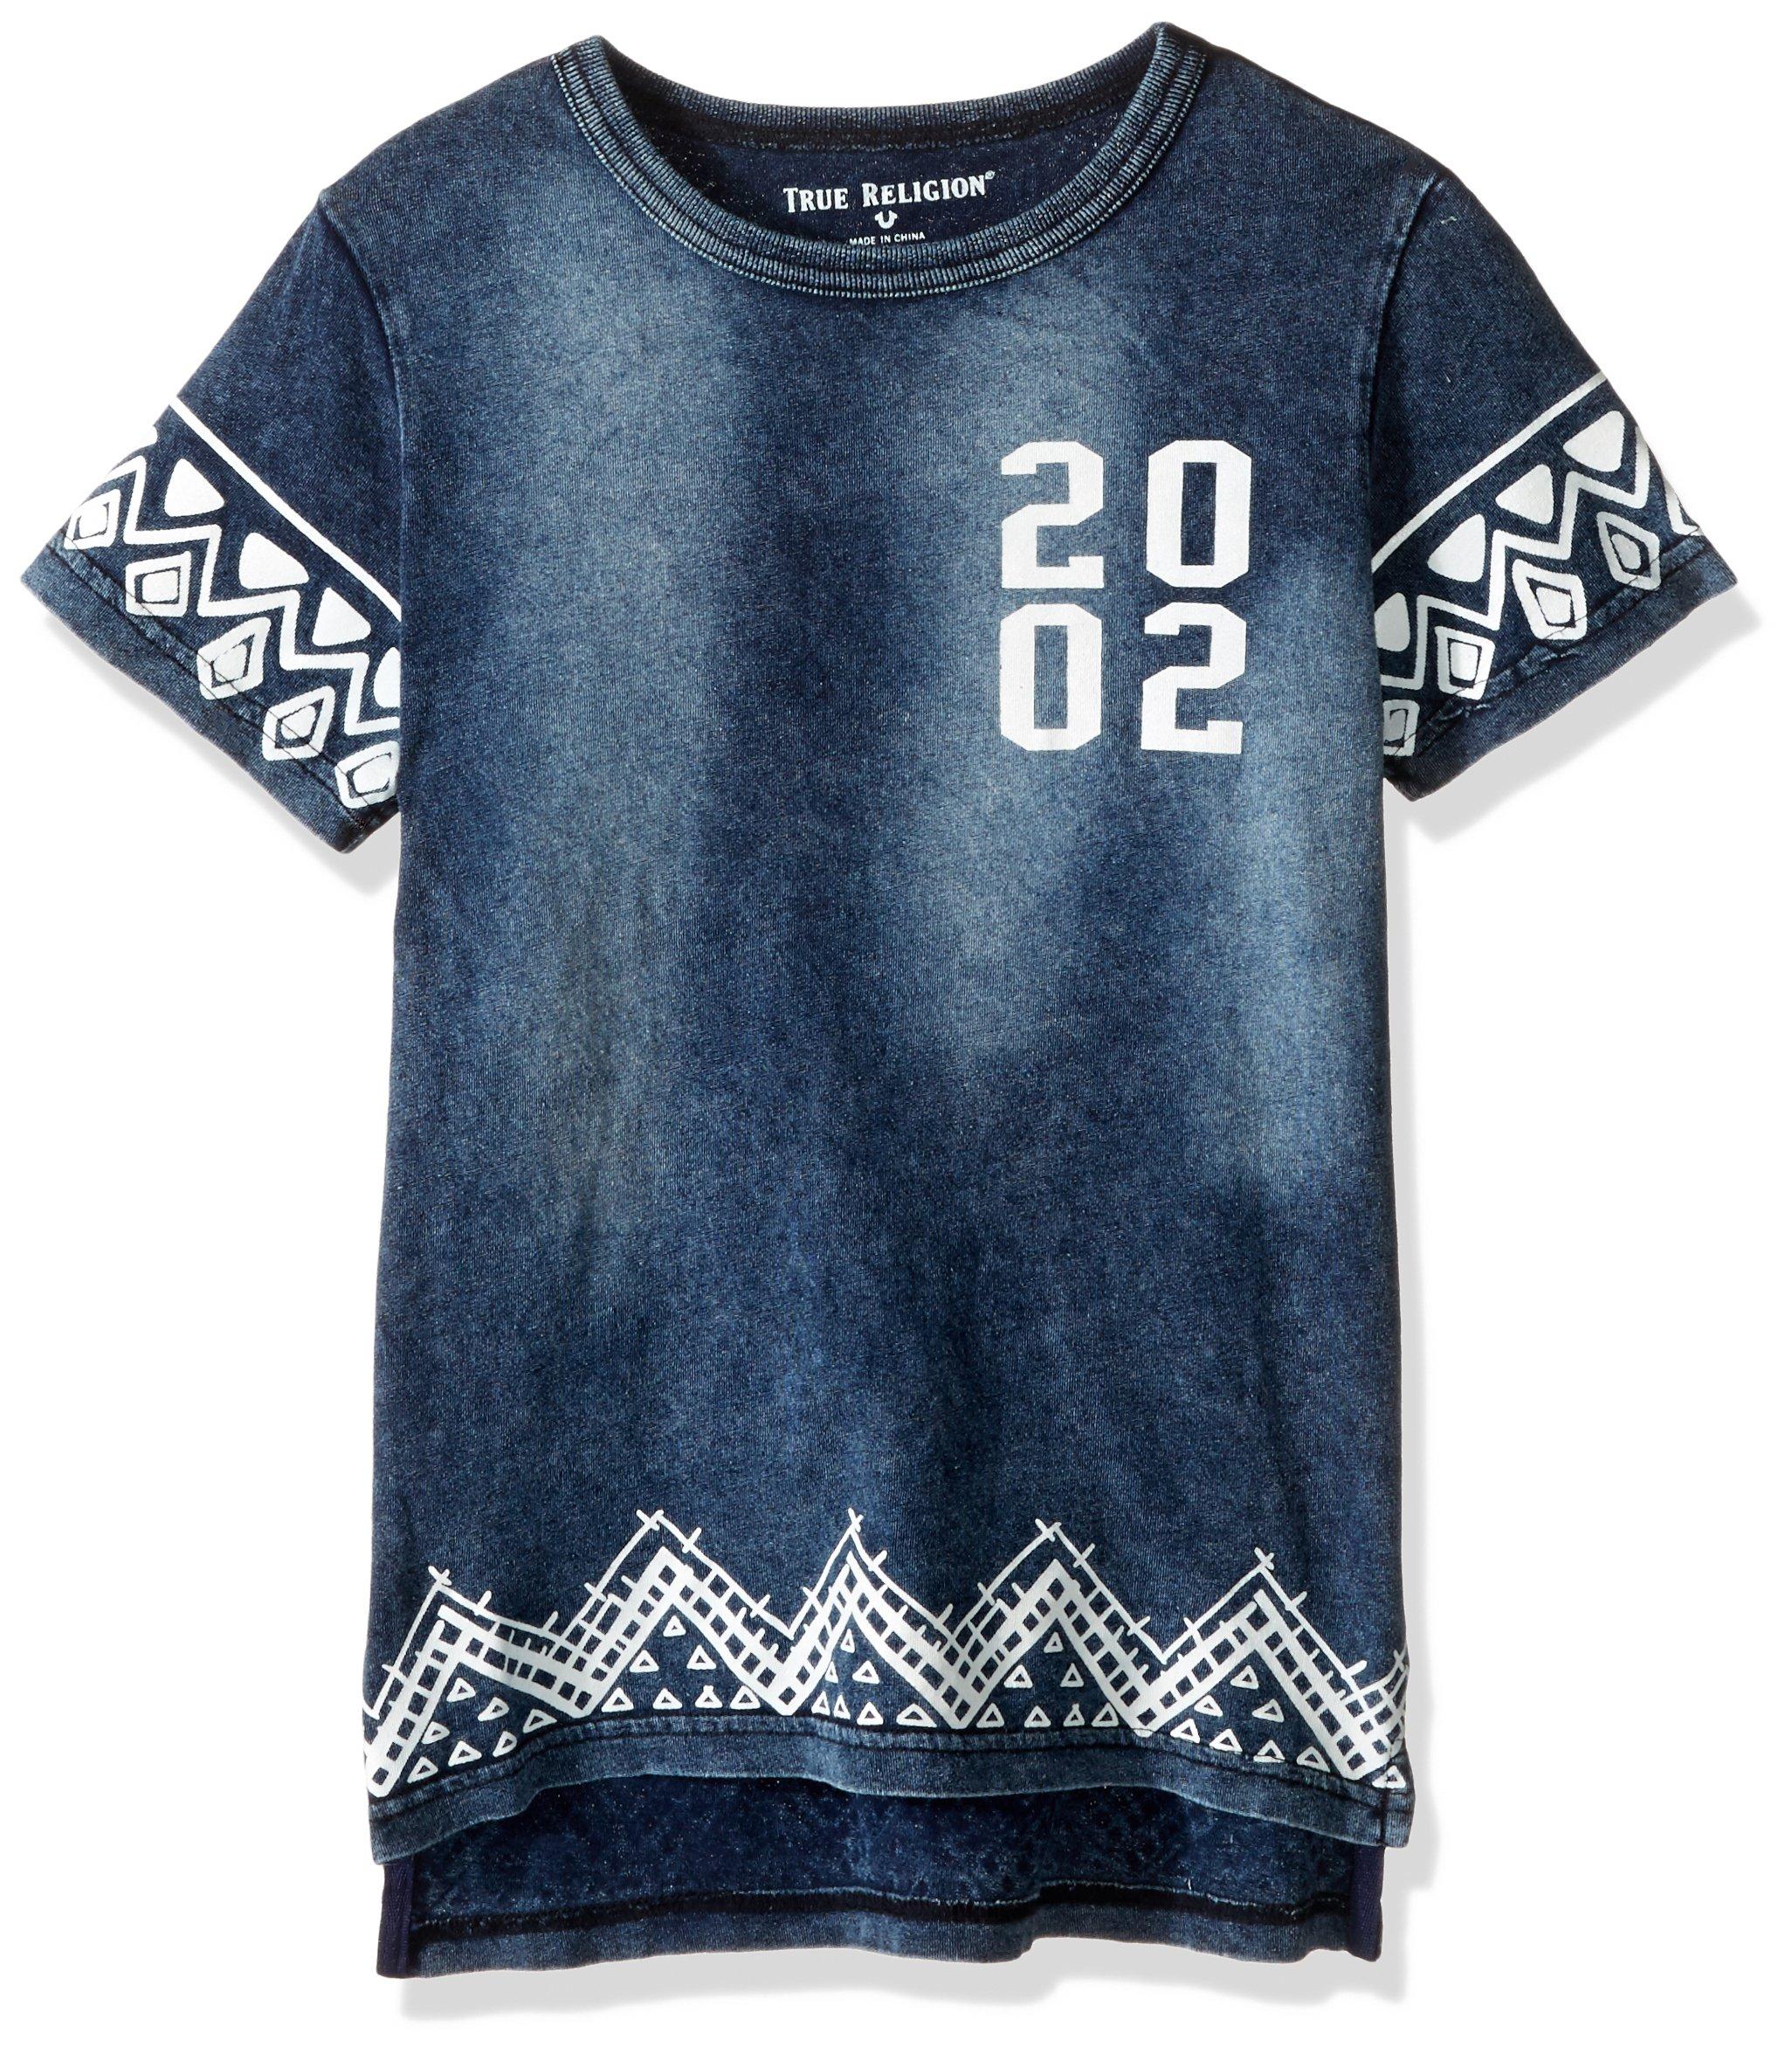 True Religion Boys' Little Logo Tee Shirt, Border Print in 7